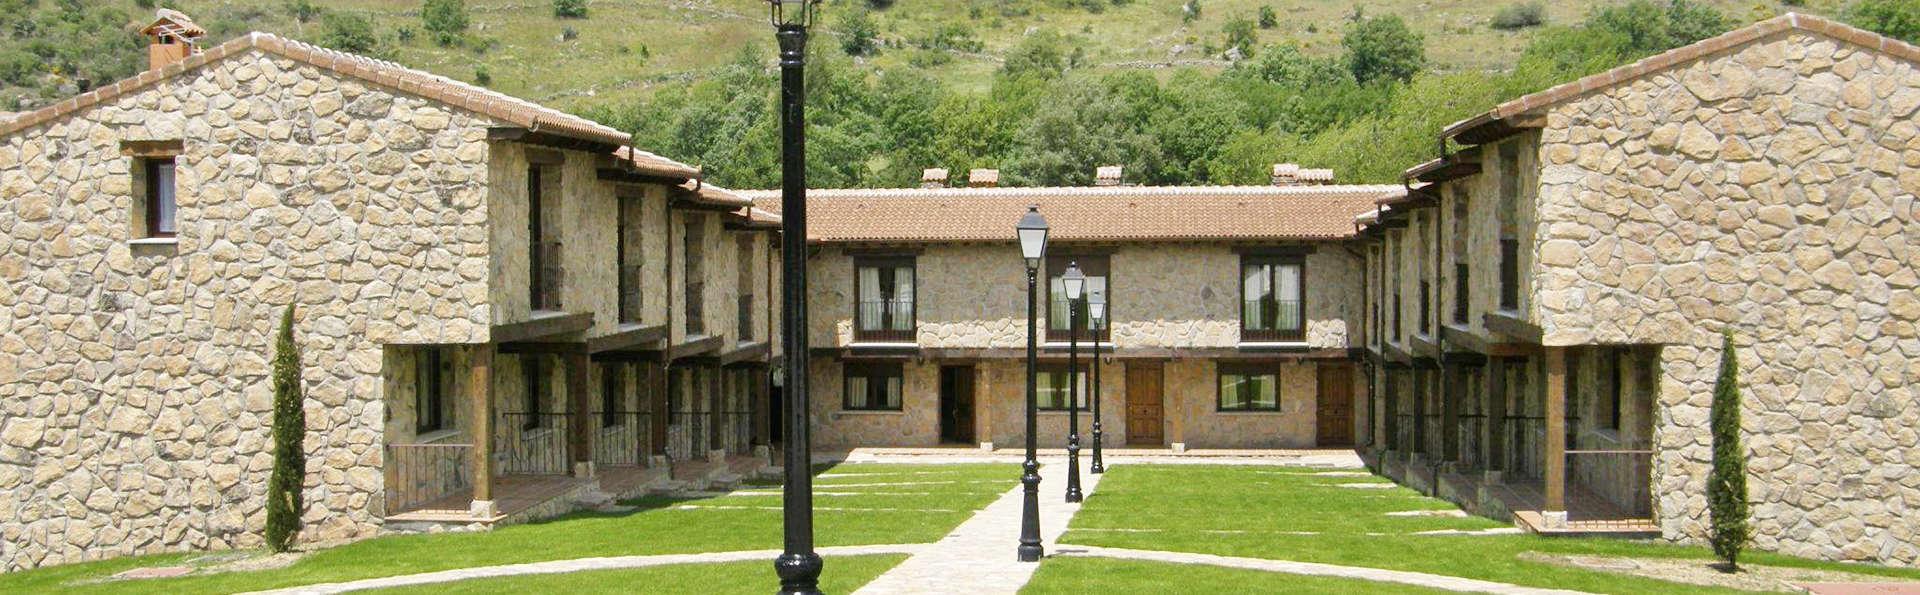 Hotel Rural Ribera del Corneja - edit_facade.jpg